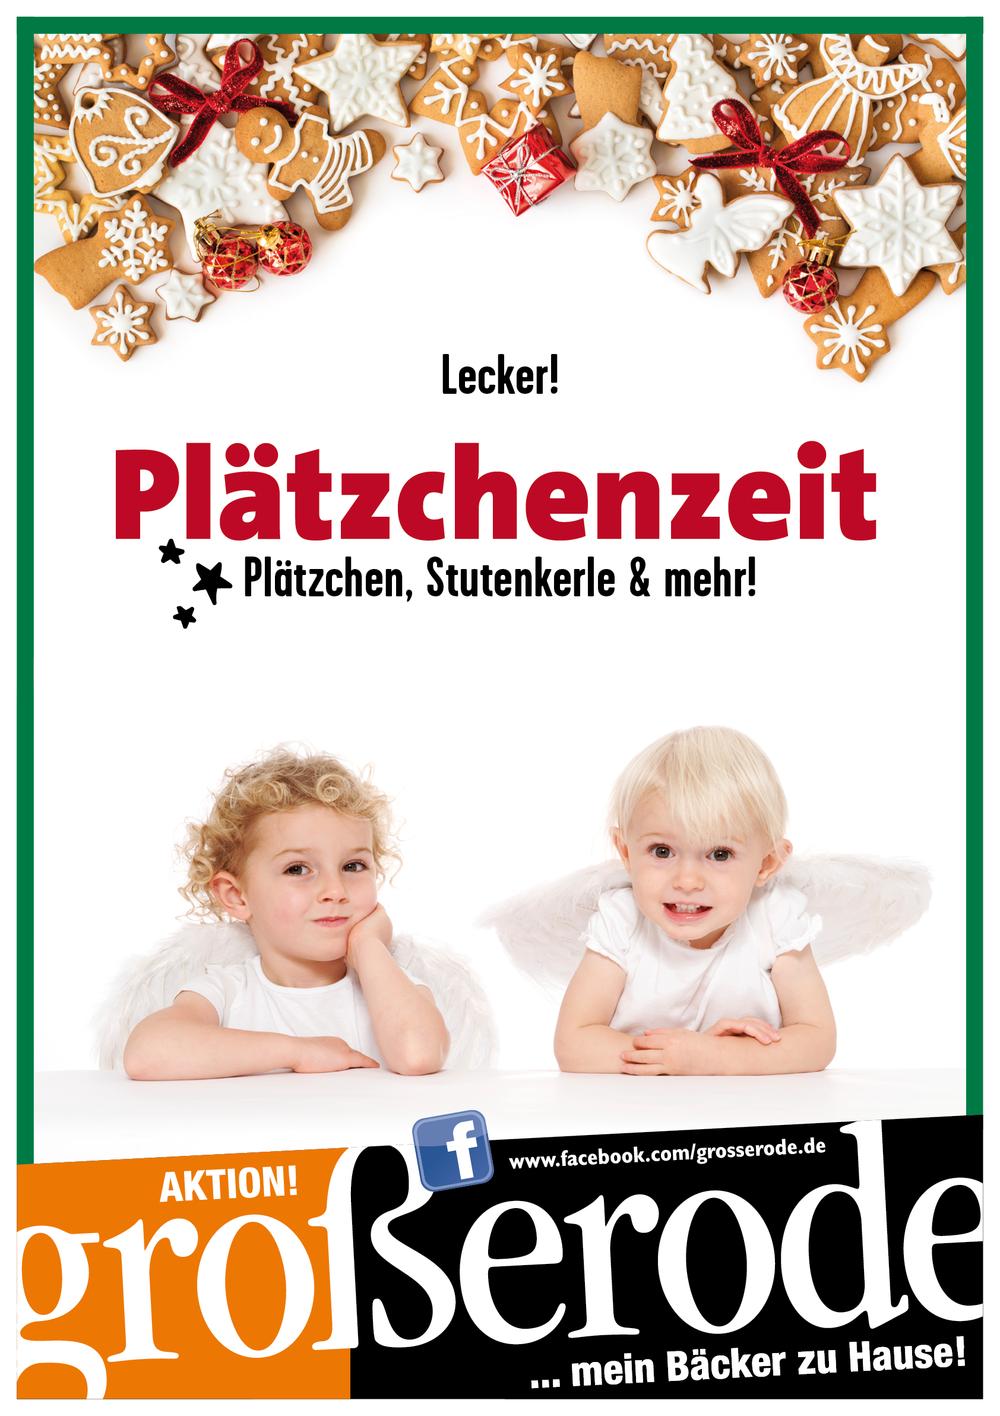 20151030_Grosserode_Plaetzchenaktion_Web.png